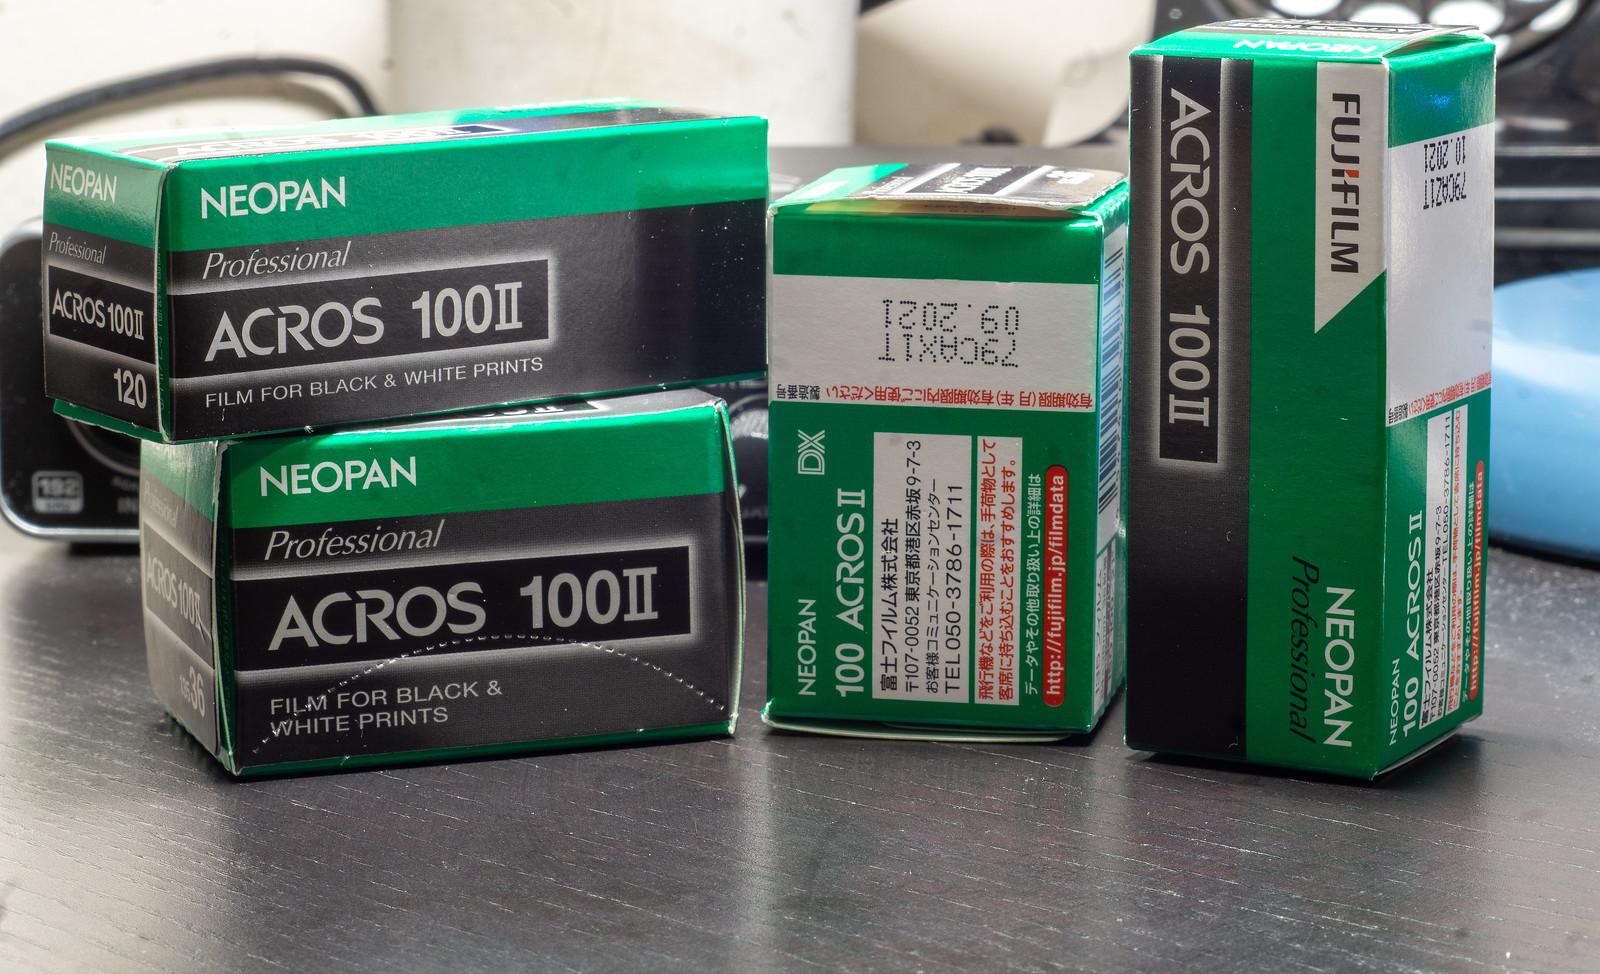 Film Review Blog No. 59 - Fujifilm Neopan Acros 100 II